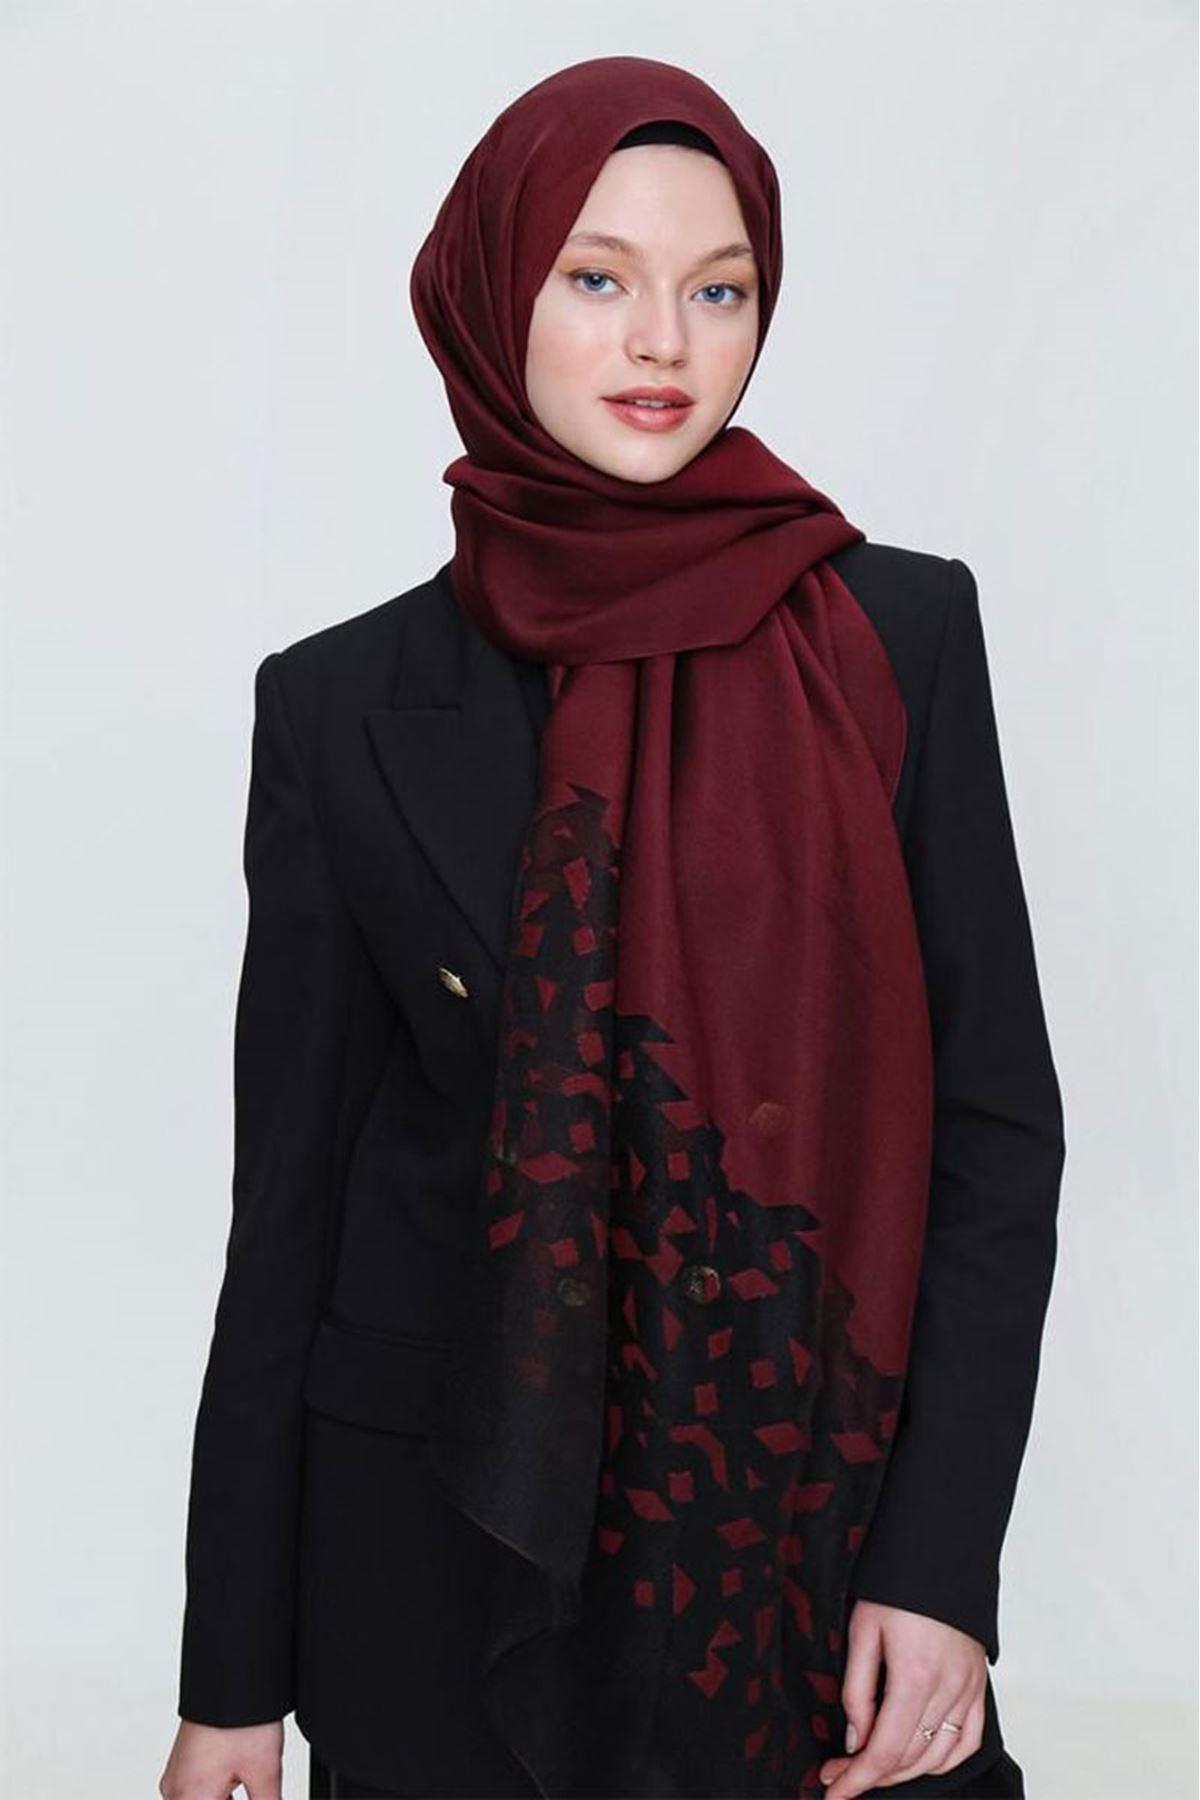 14025 Miray İbiza Shawl - Claret Red